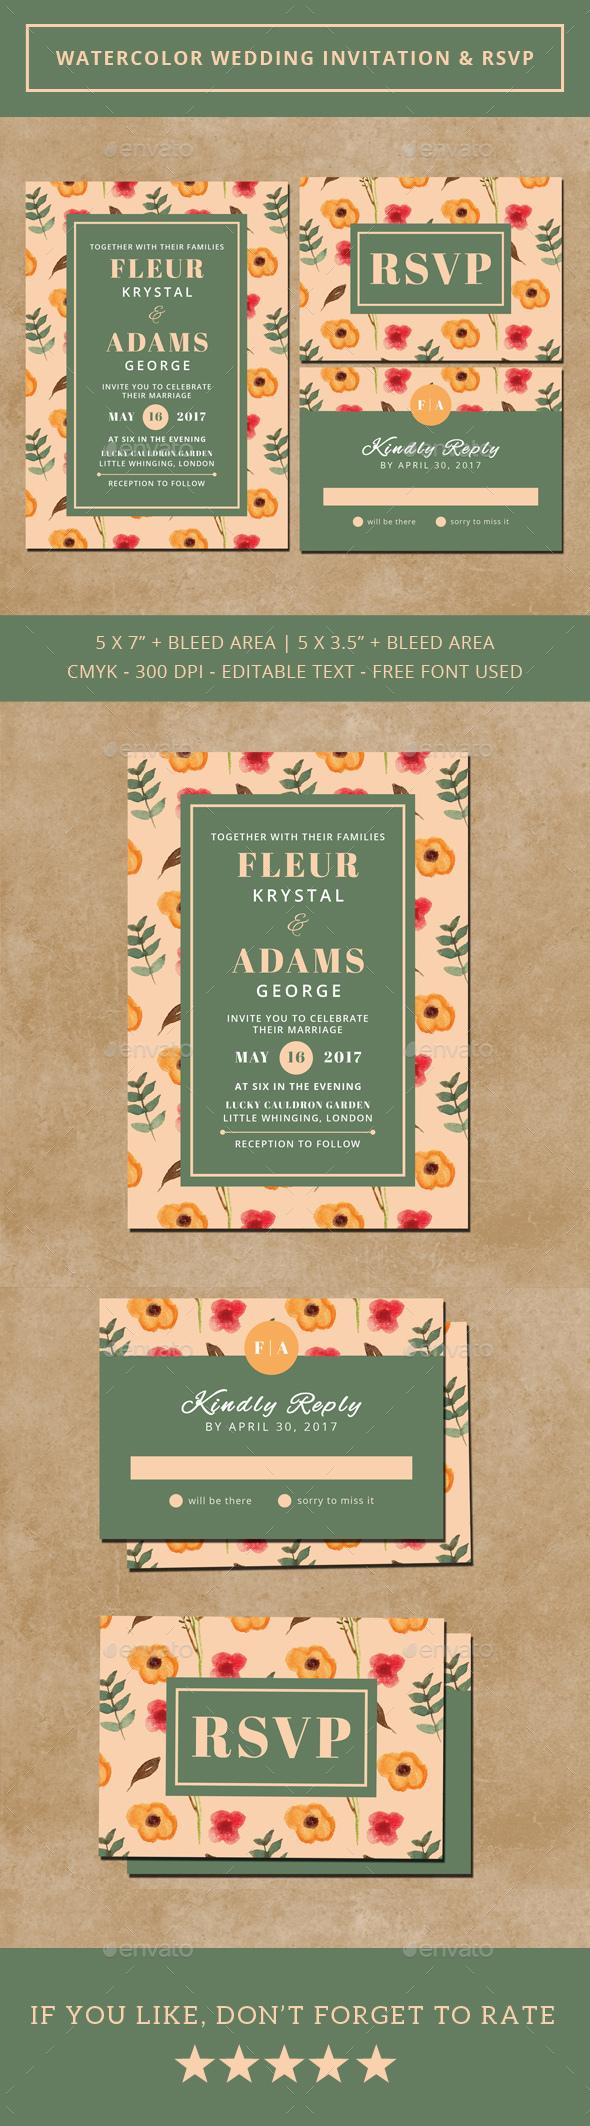 Watercolor Wedding Invitation & RSVP - Weddings Cards & Invites